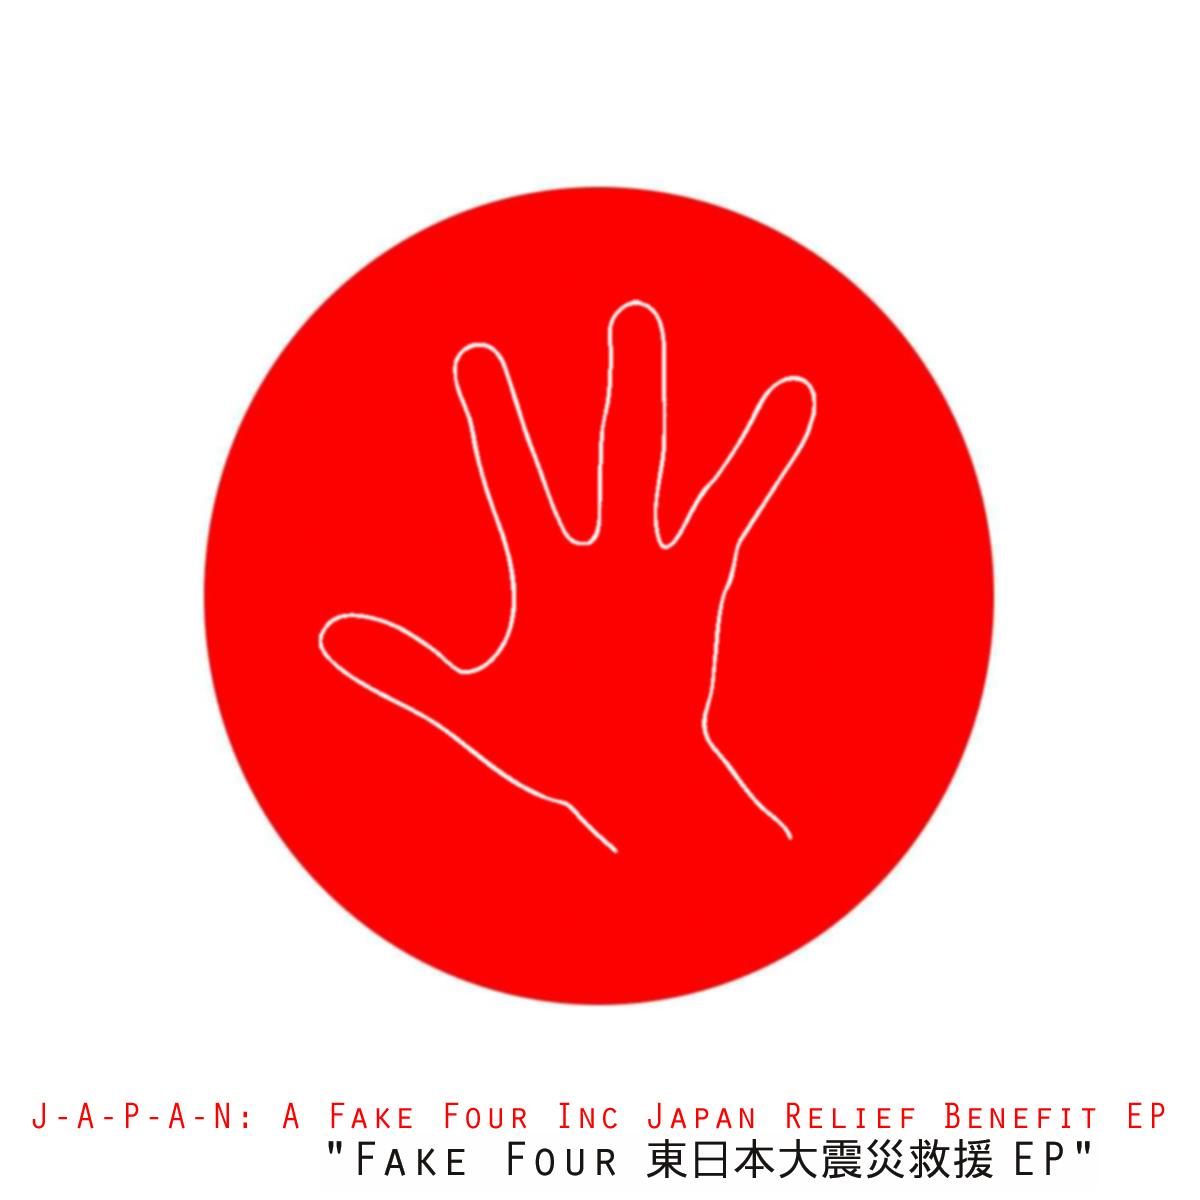 "Myka 9, Moka Only & Factor ""J-A-P-A-N"" // J-A-P-A-N: A Fake Four, Inc. Japan Relief Benefit EP"